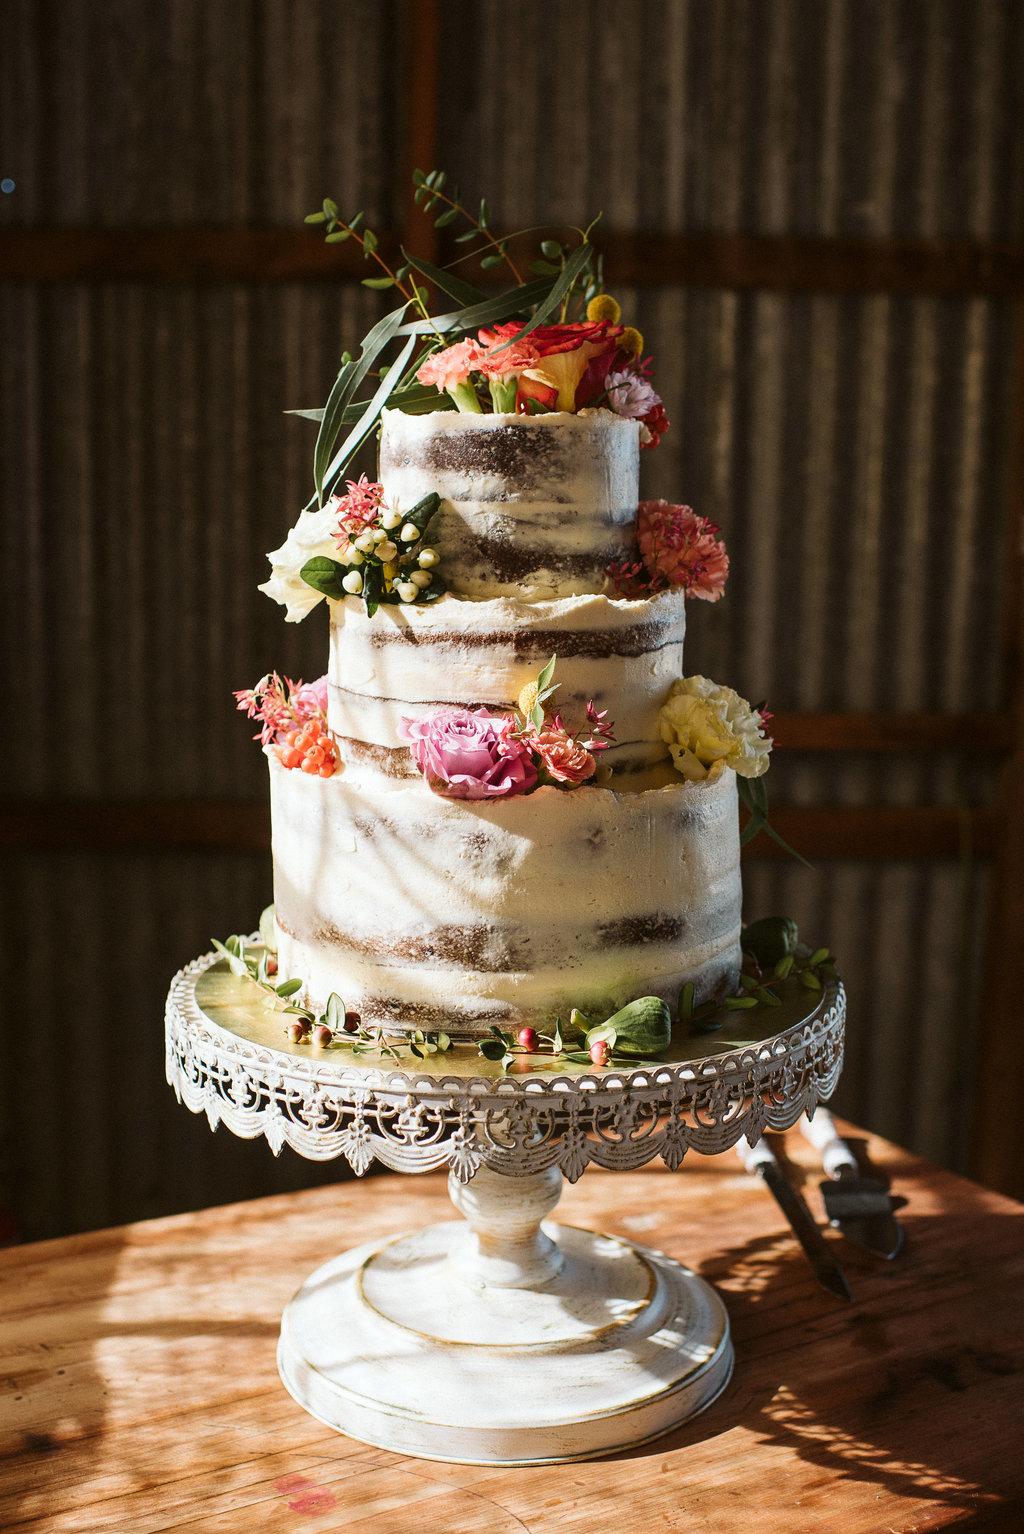 Peppermint Kitchen semi-naked Wanaka Wedding cake